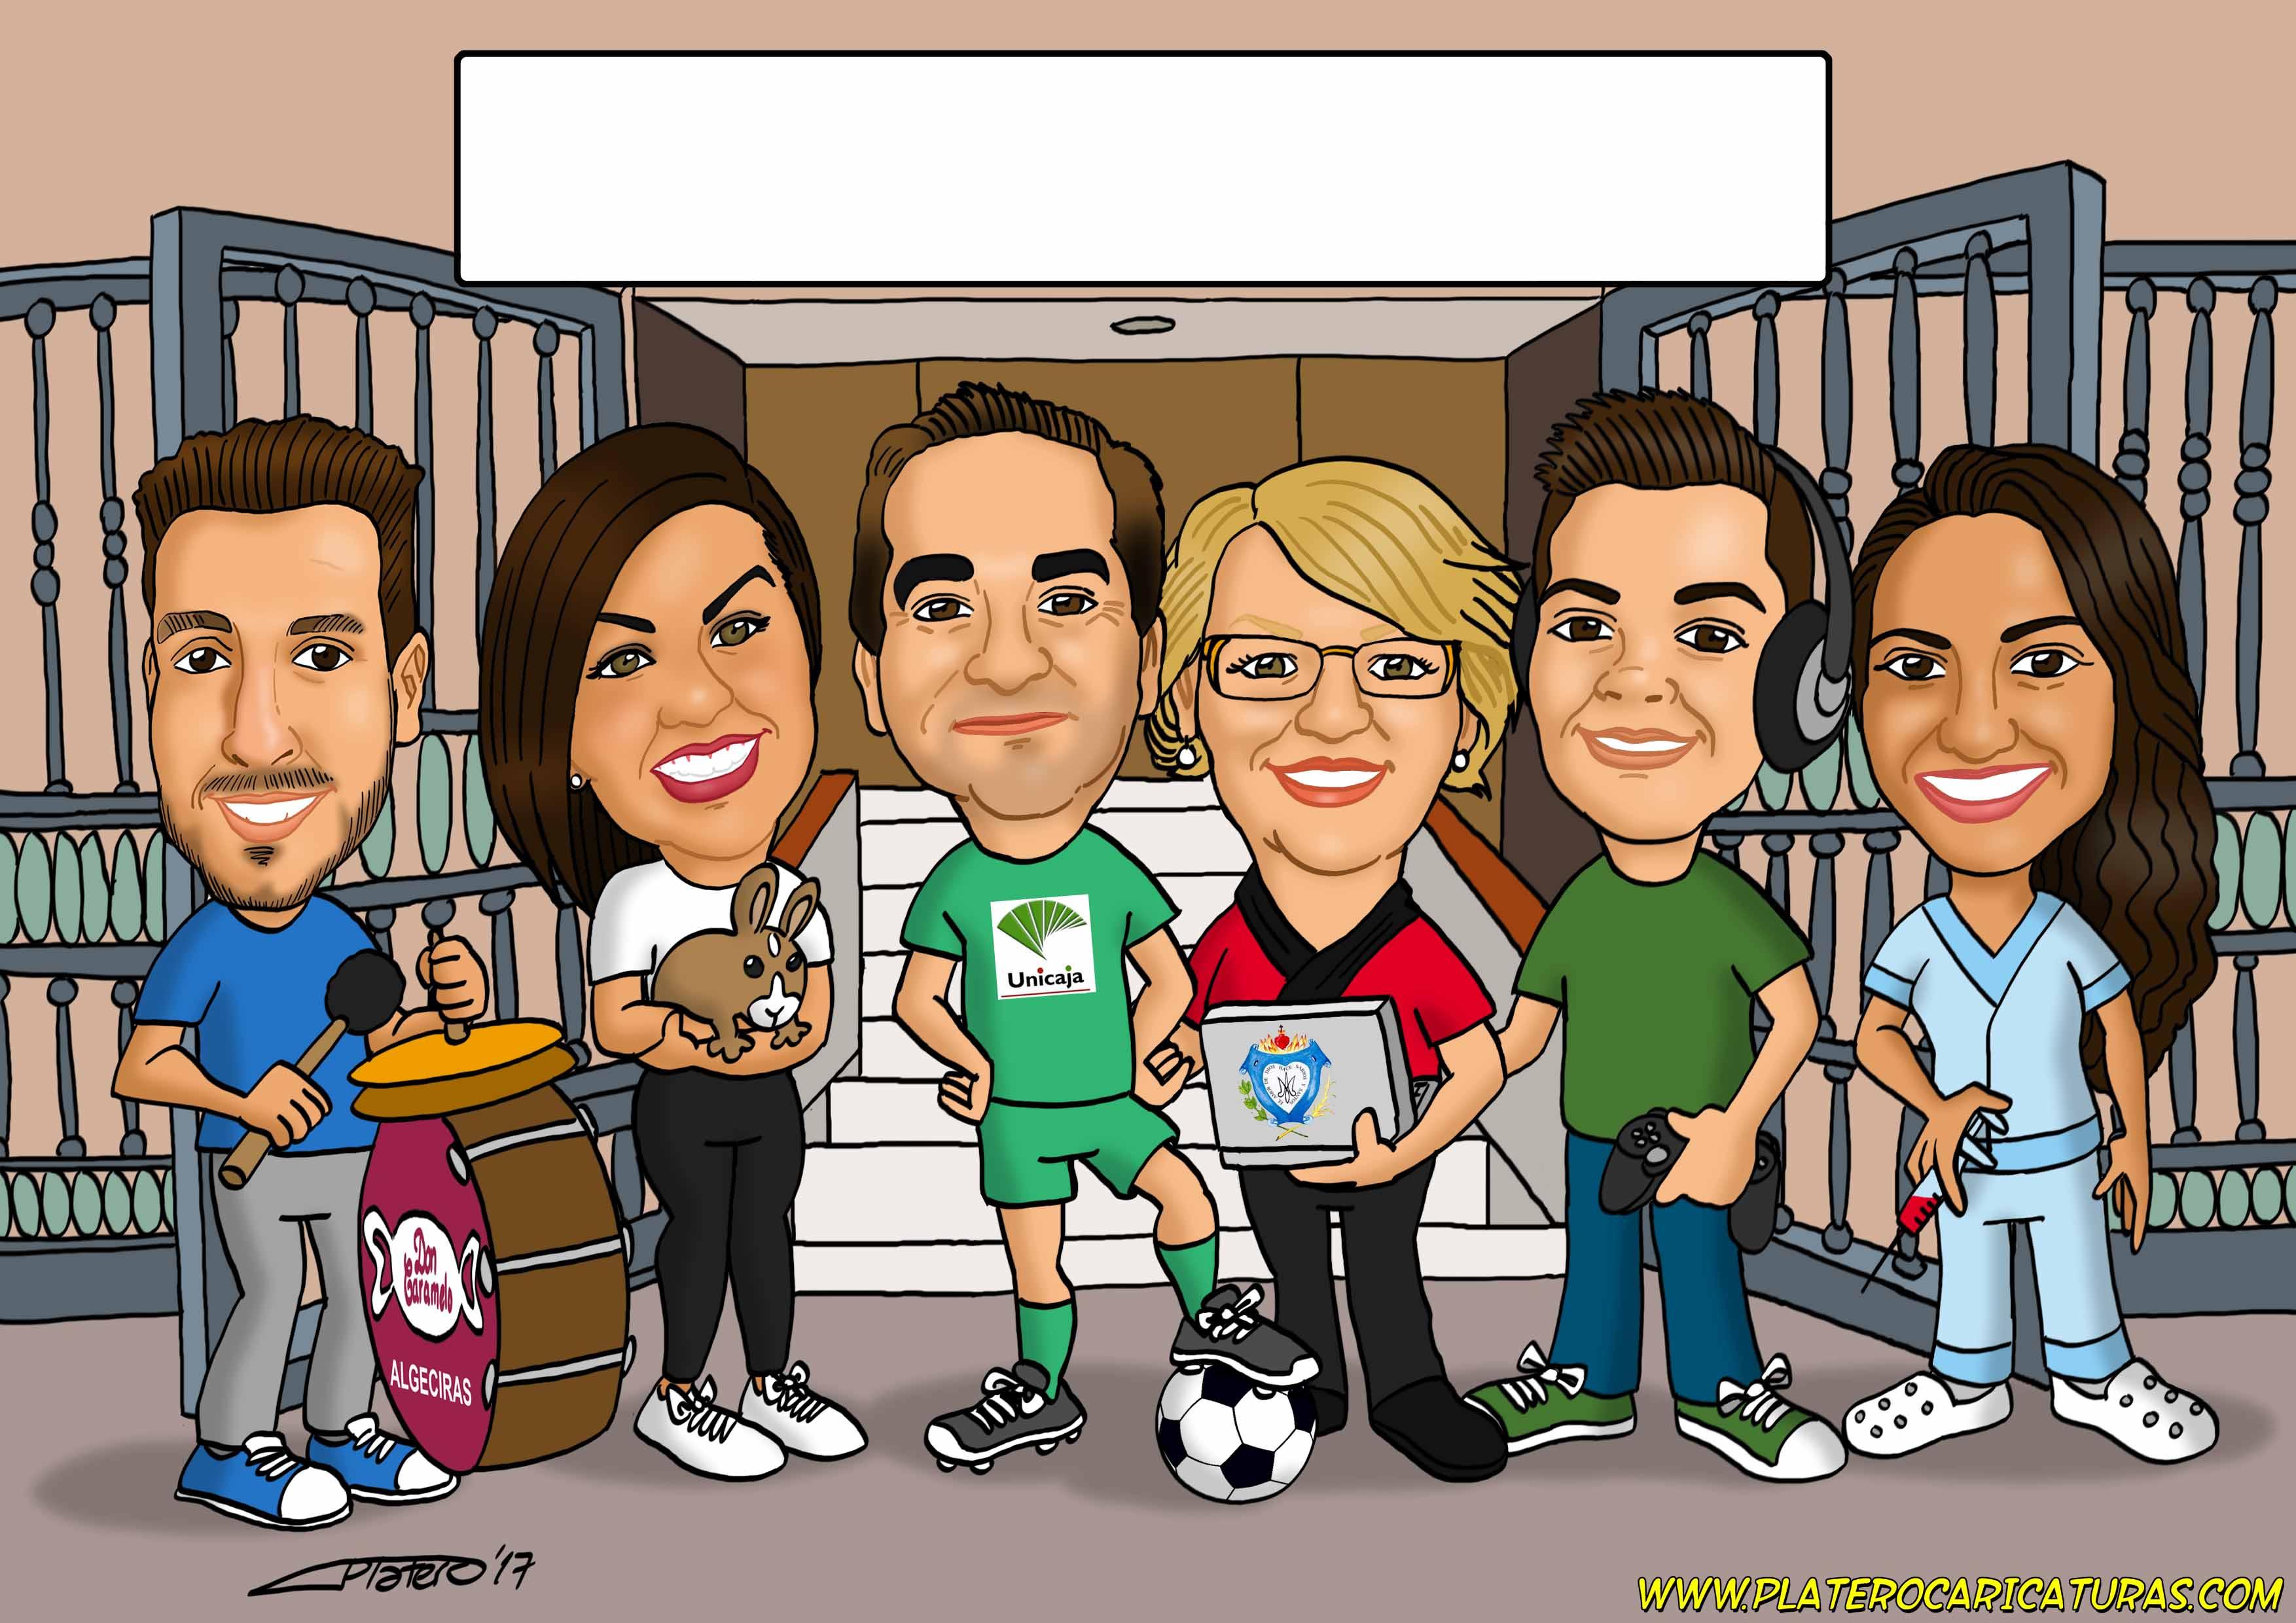 familia_caricatura_por_encargo_caricaturas_platerocaricaturas